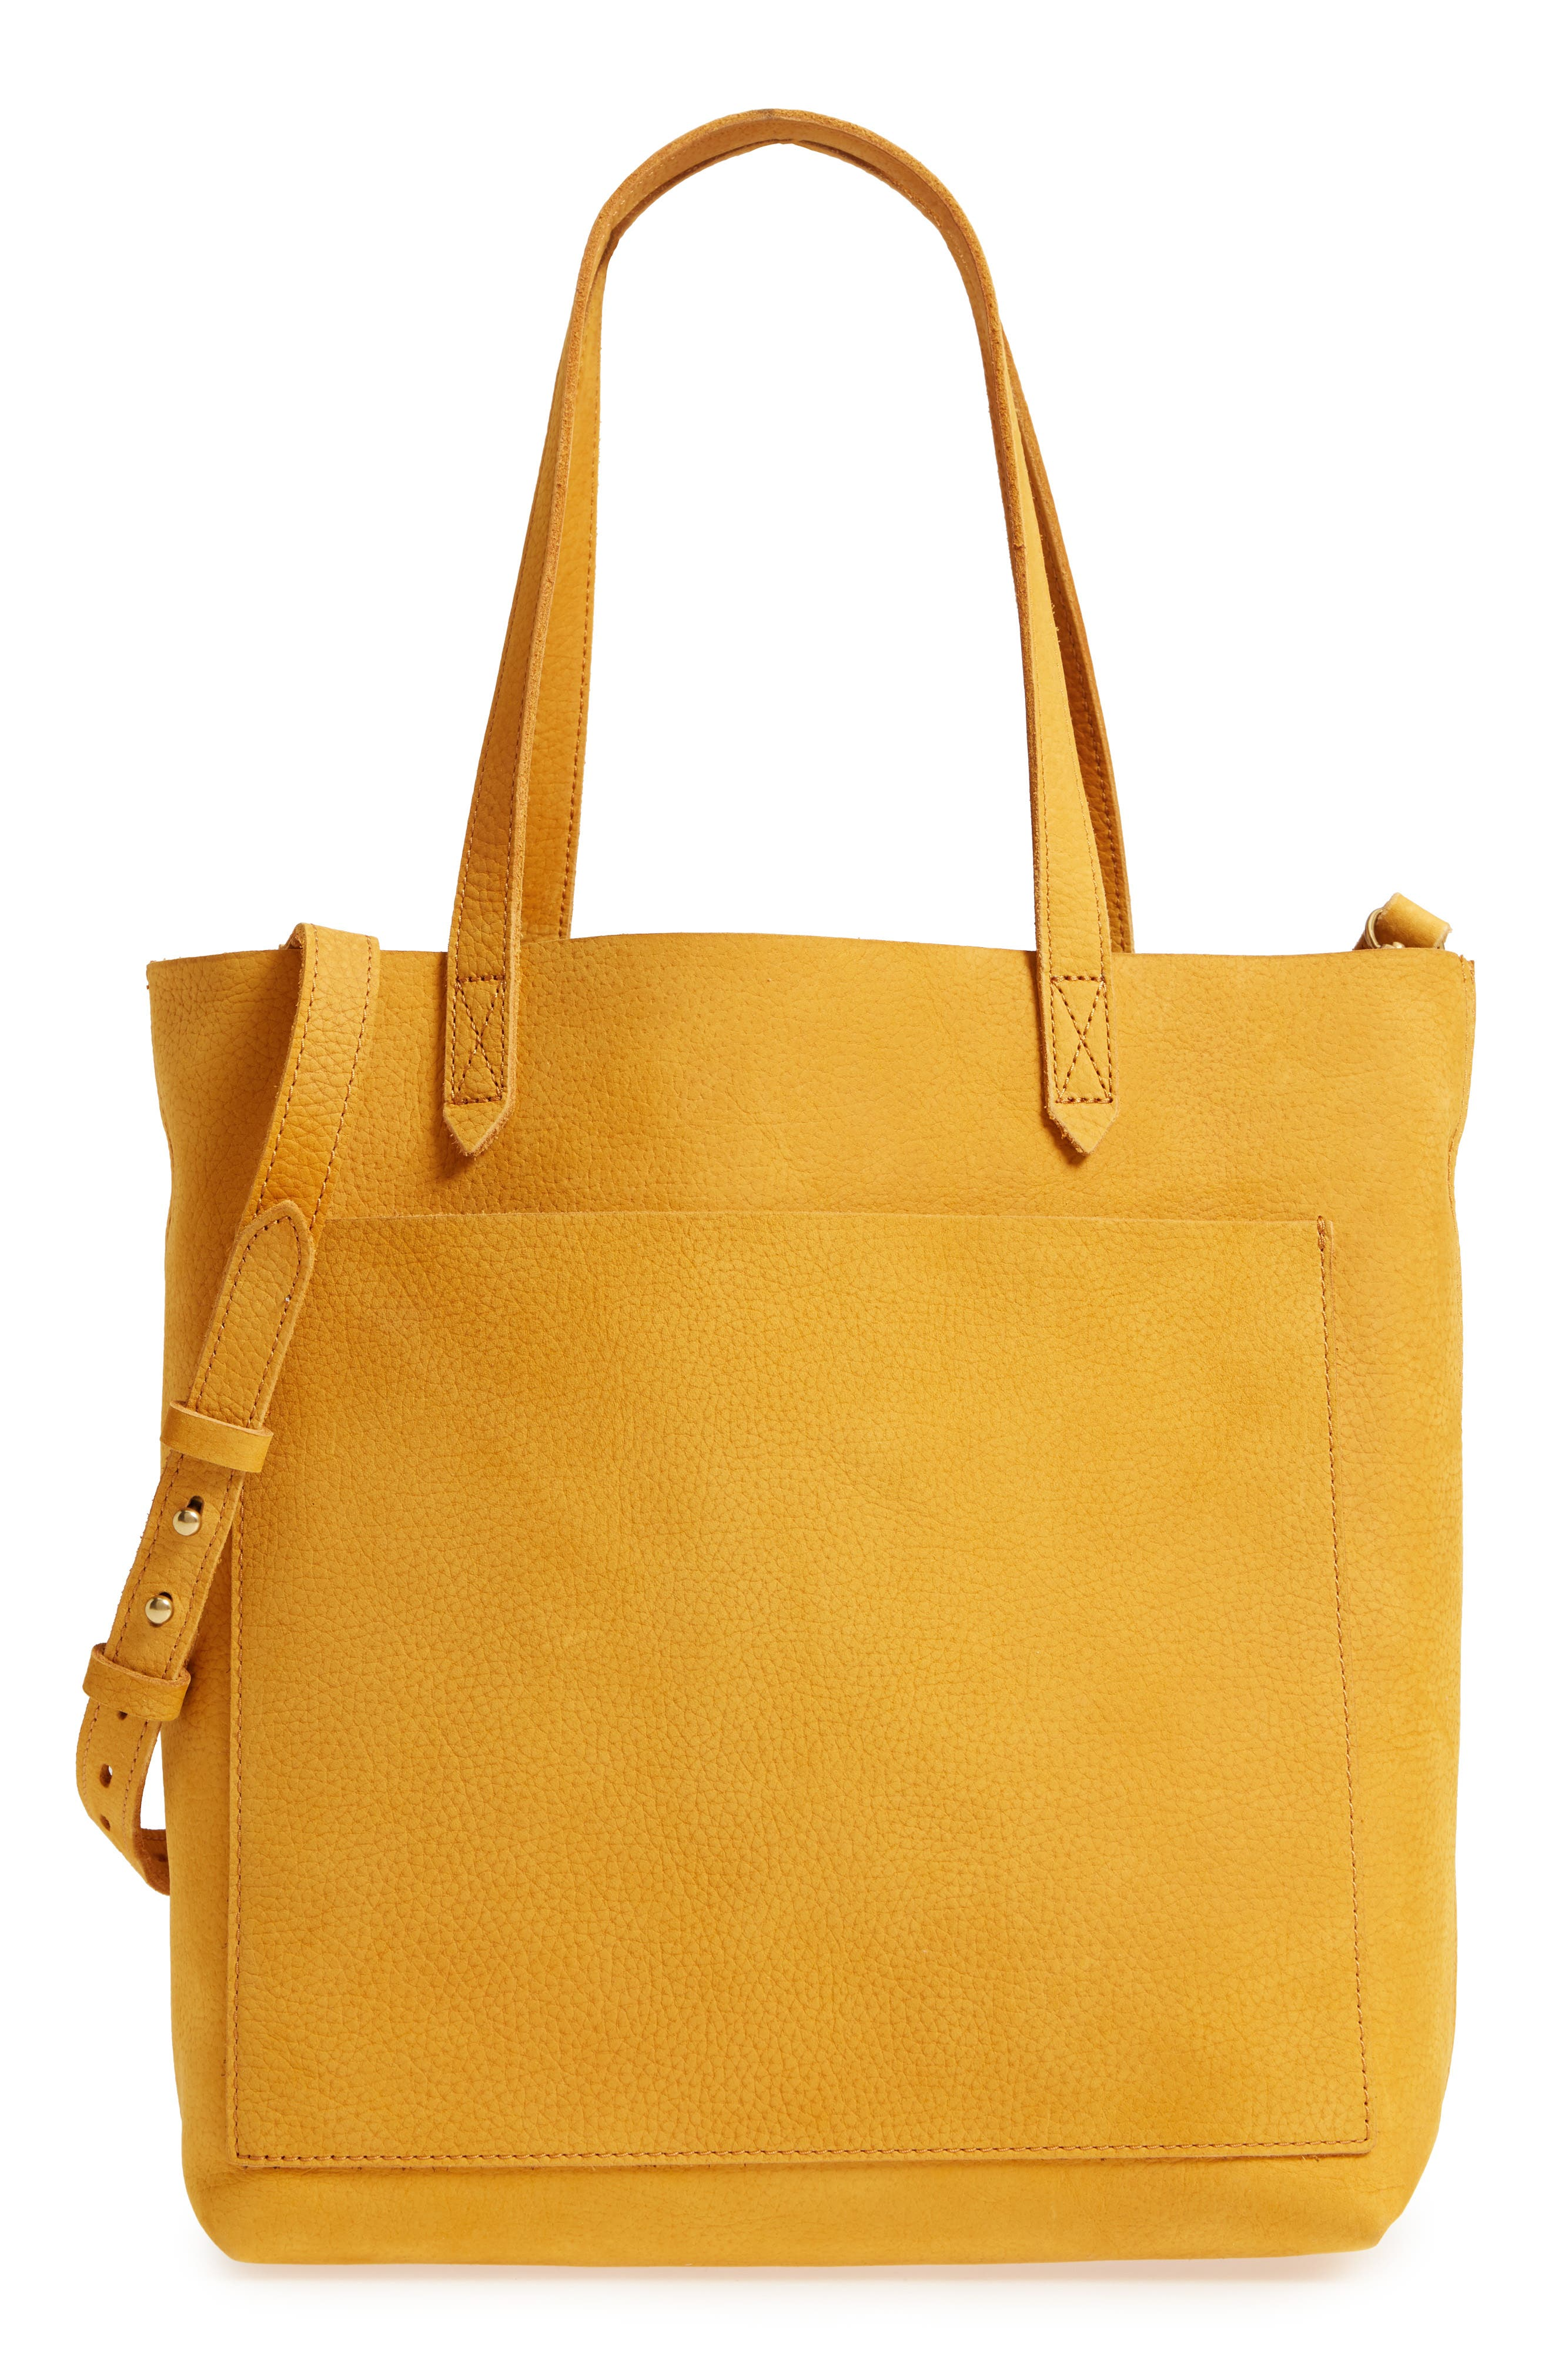 Medium Leather Transport Tote,                         Main,                         color, Celestial Gold